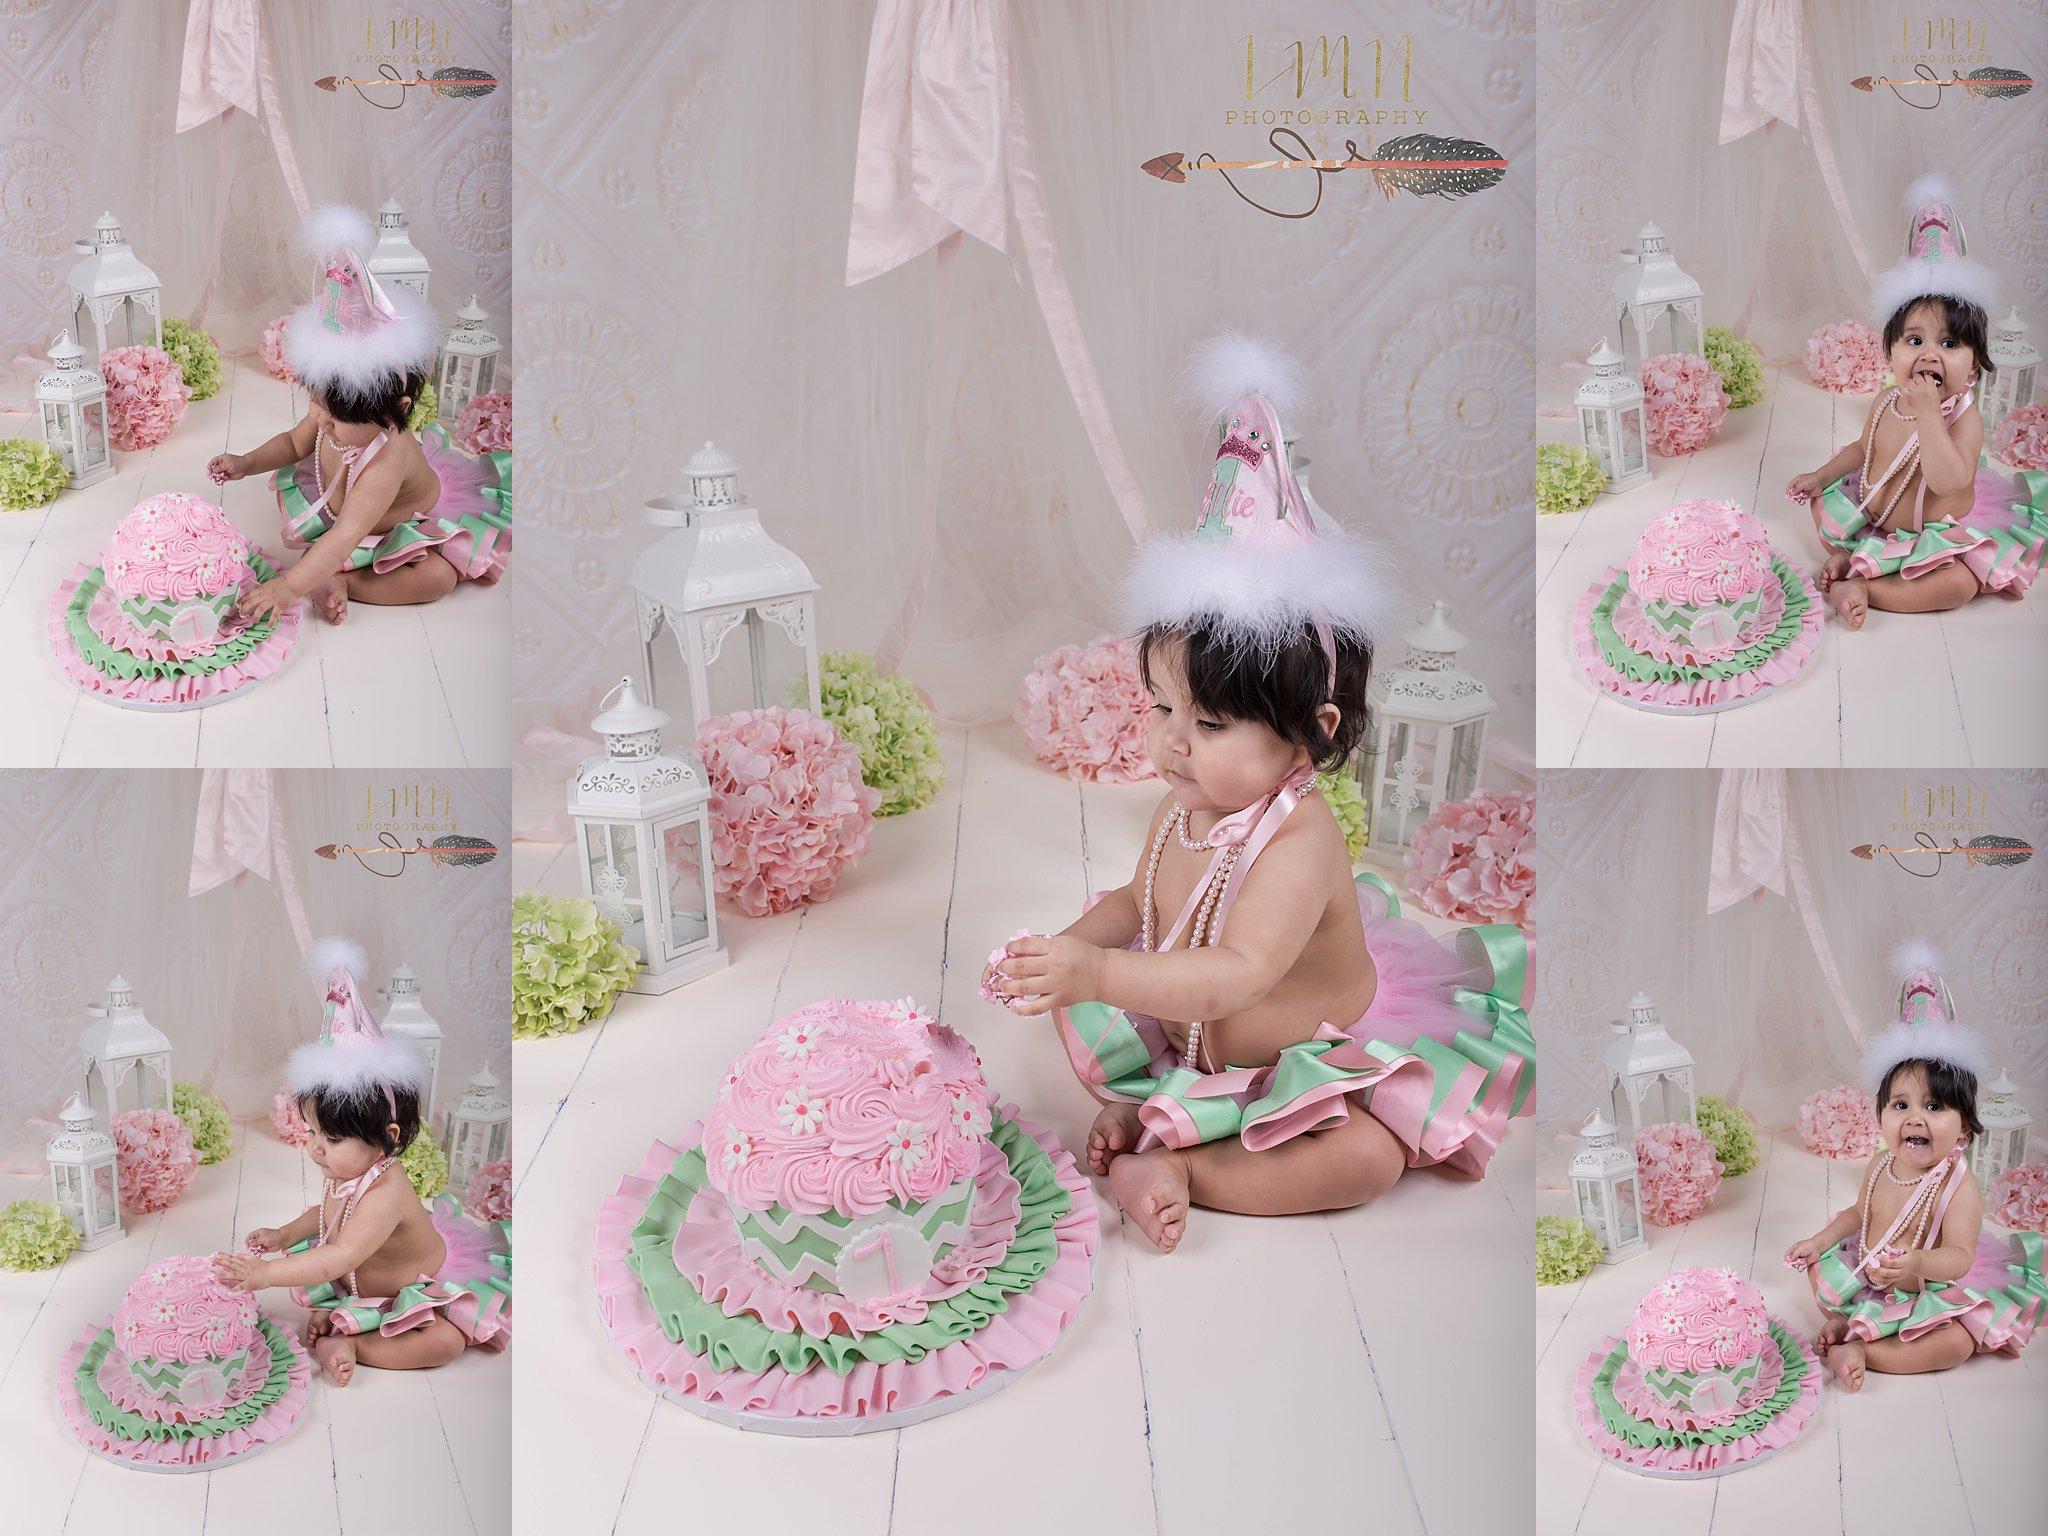 Cypress TX Cake Smash Photography 77433 77429